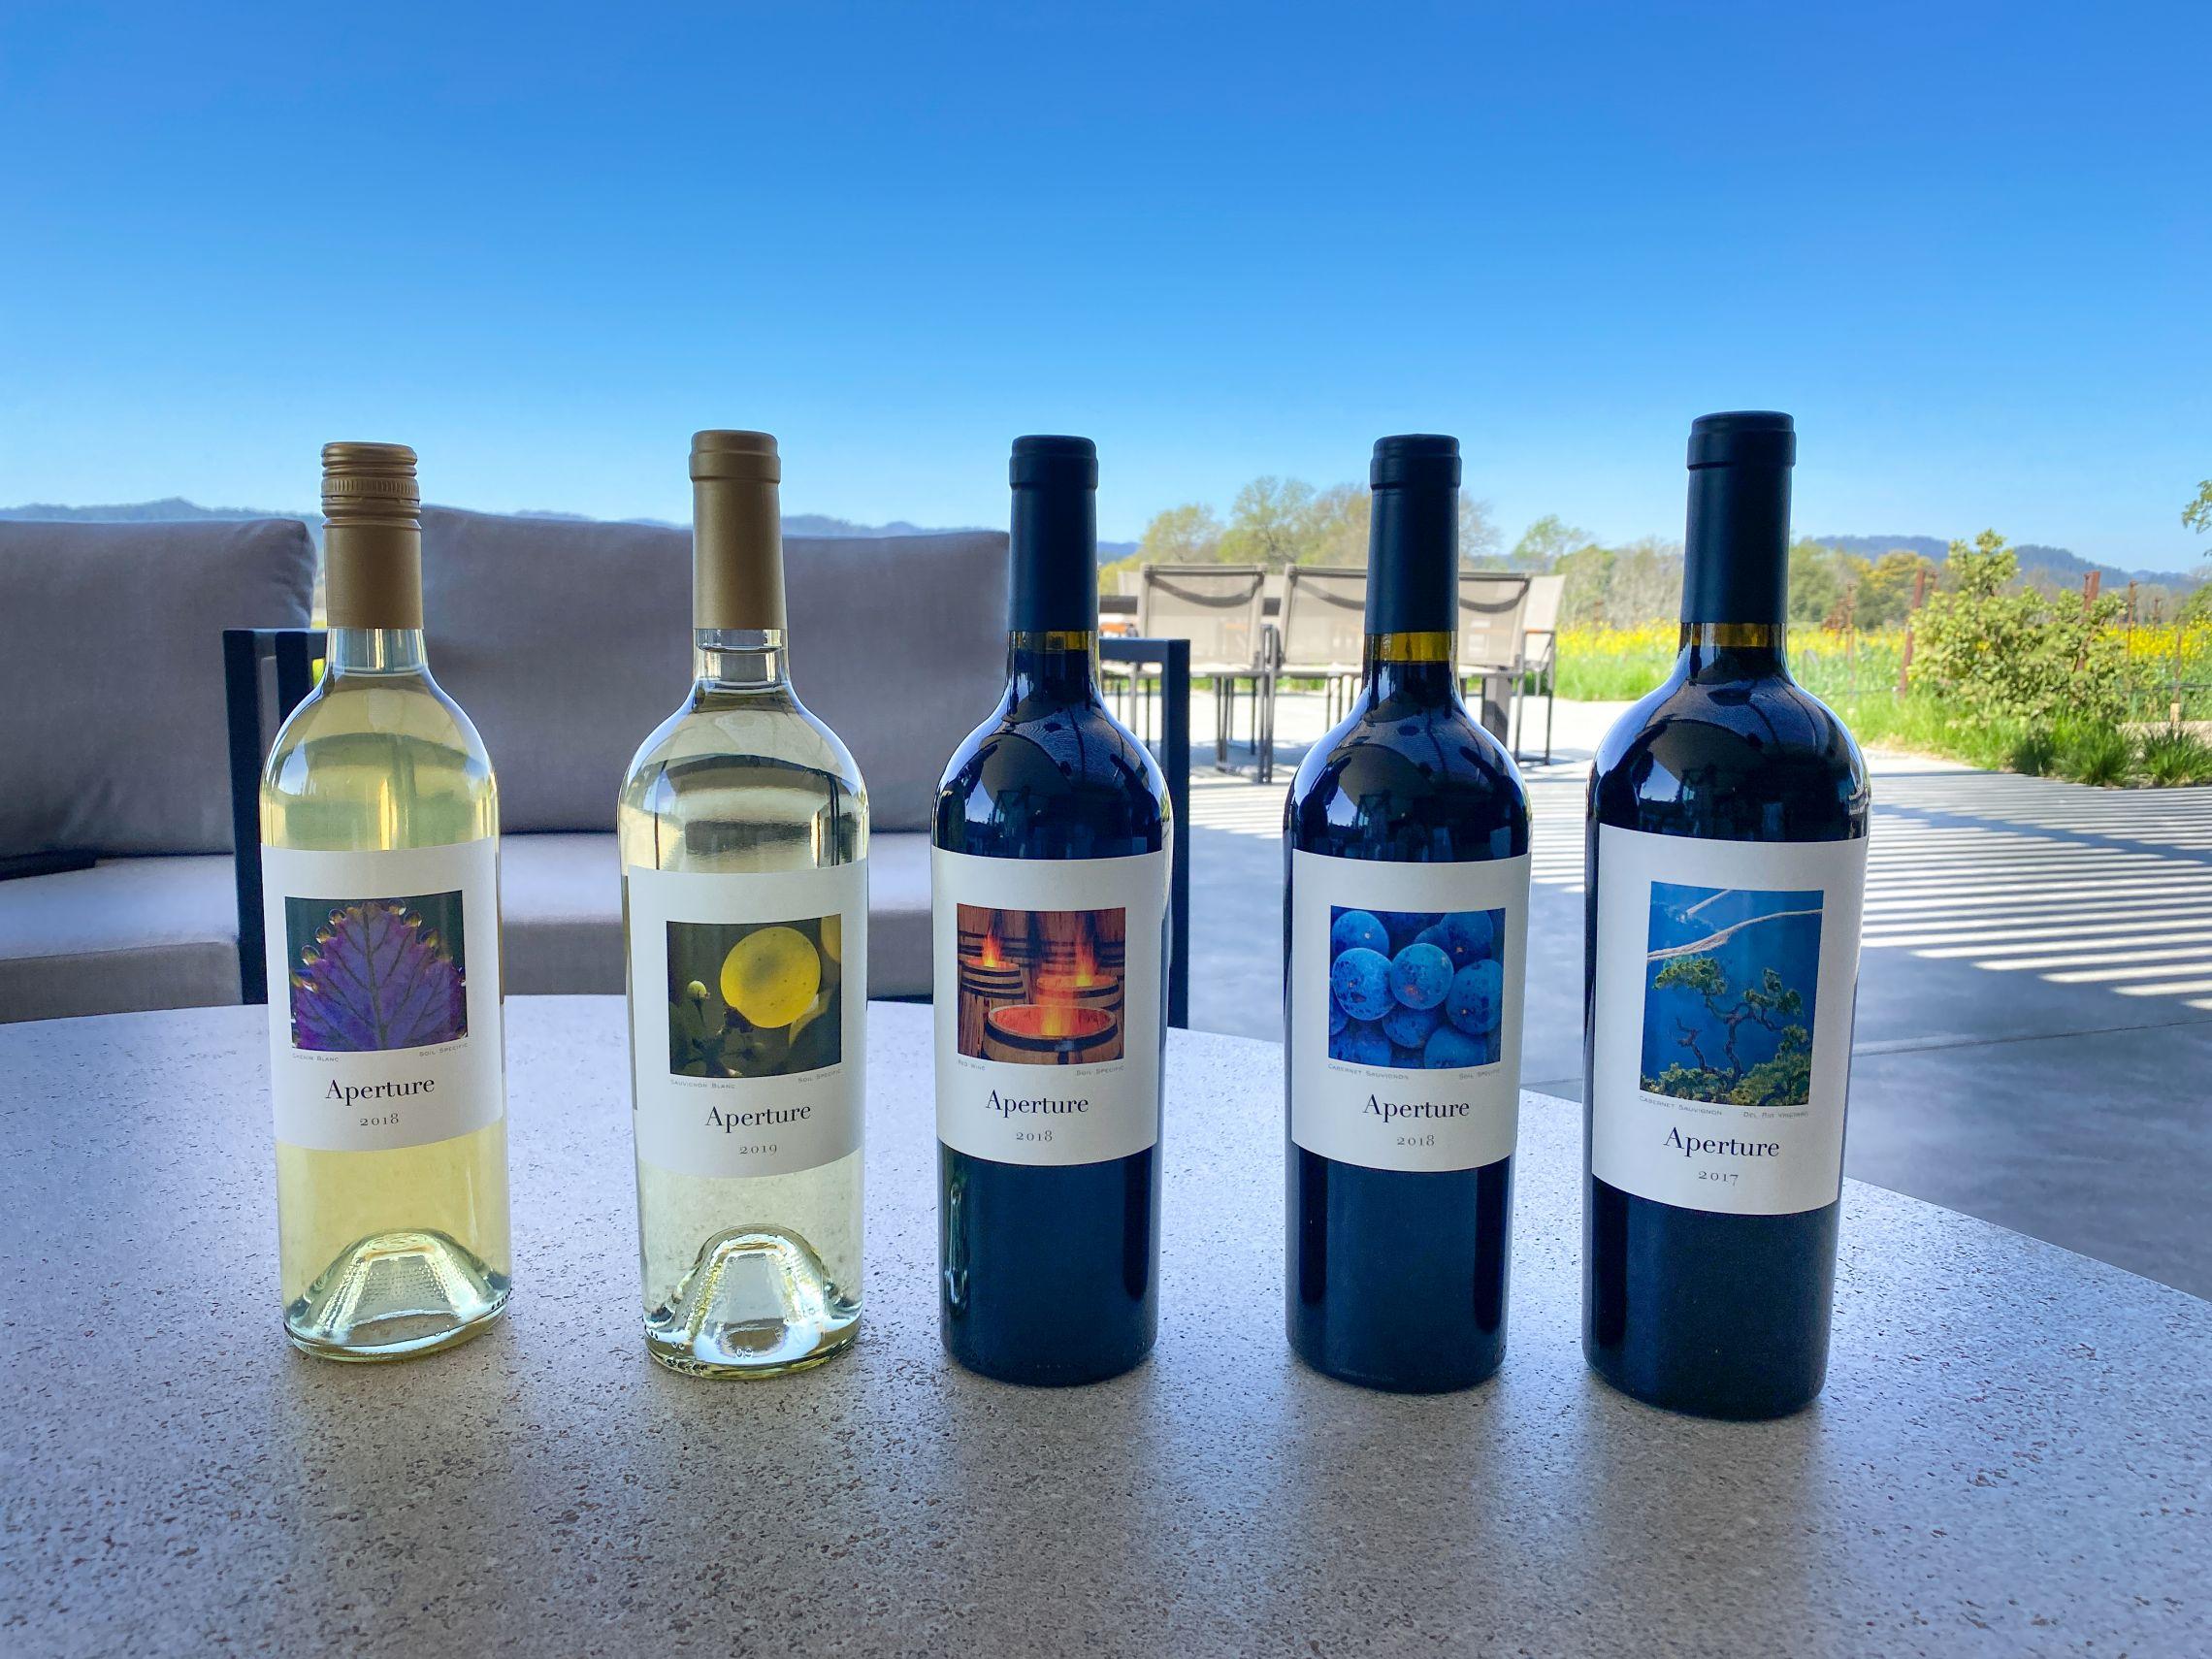 Wine tasting at Aperture Cellars in Sonoma County.